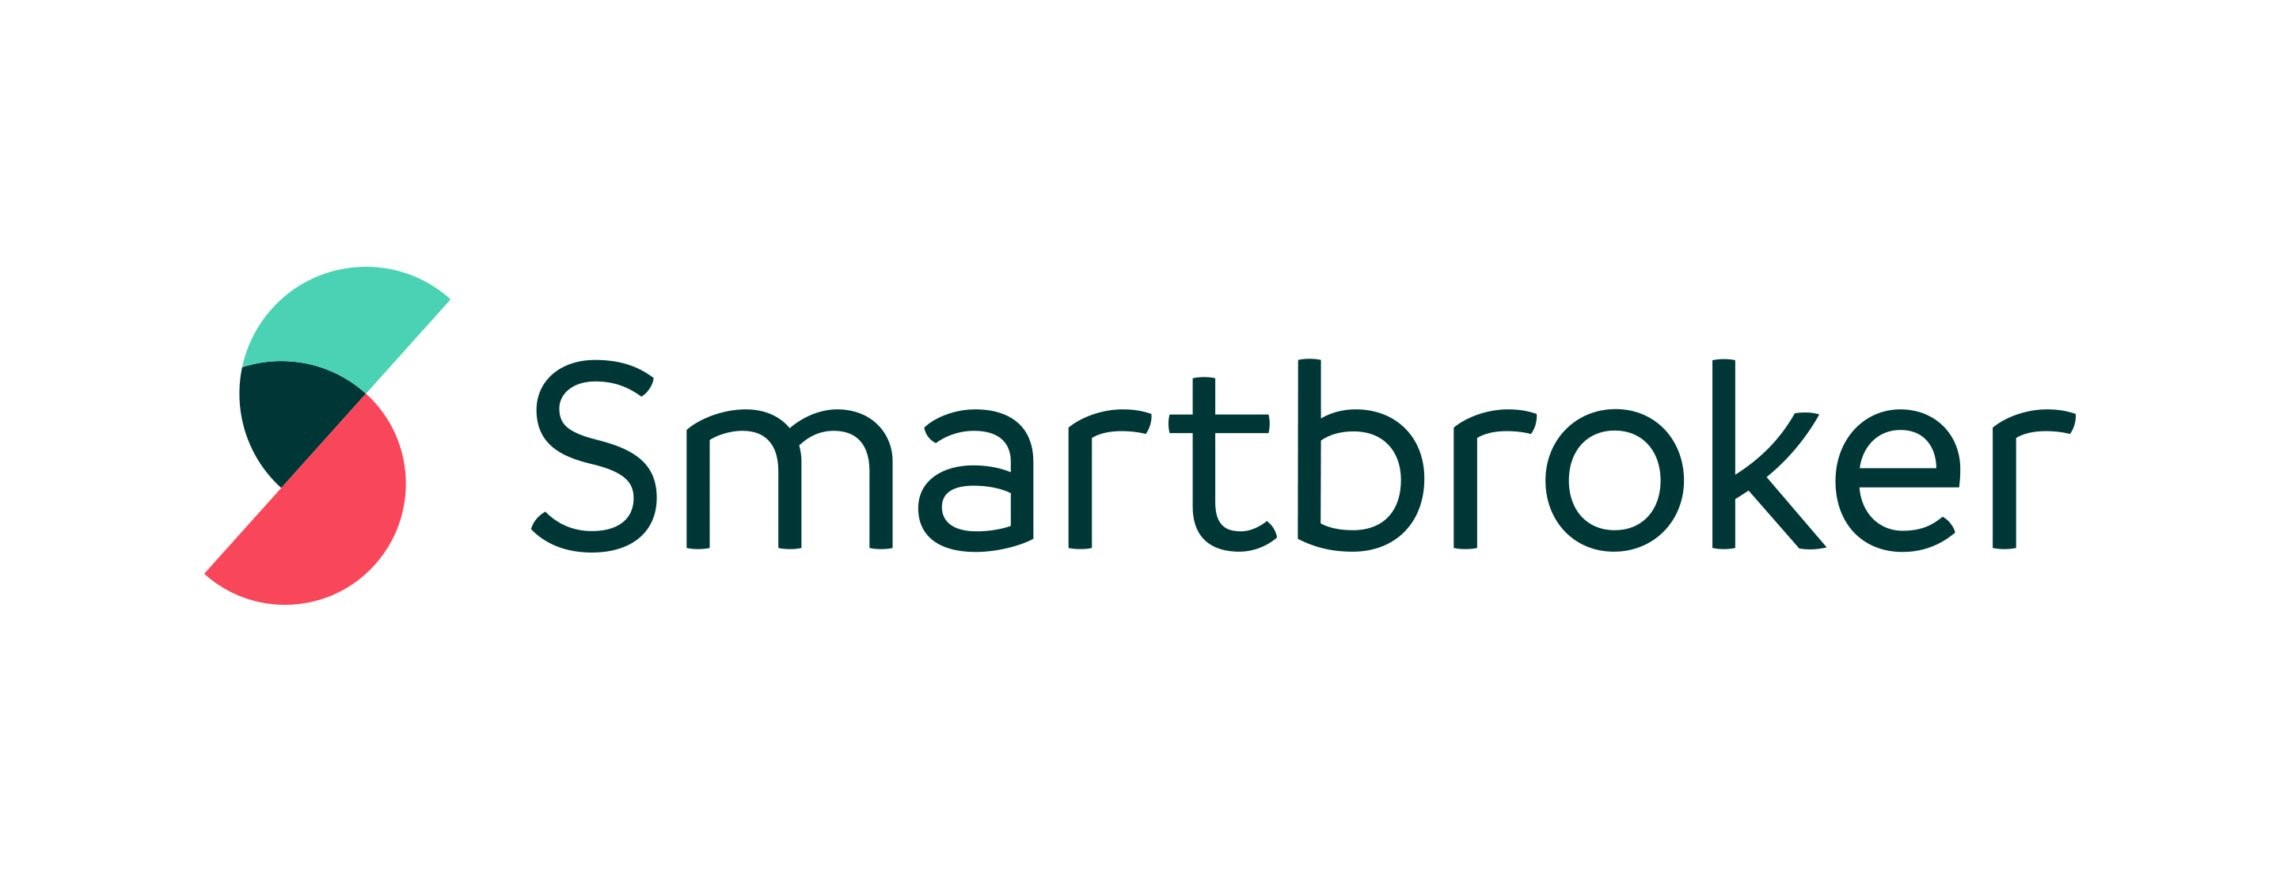 Logo Smartbroker - Kostenloses Aktiendepot